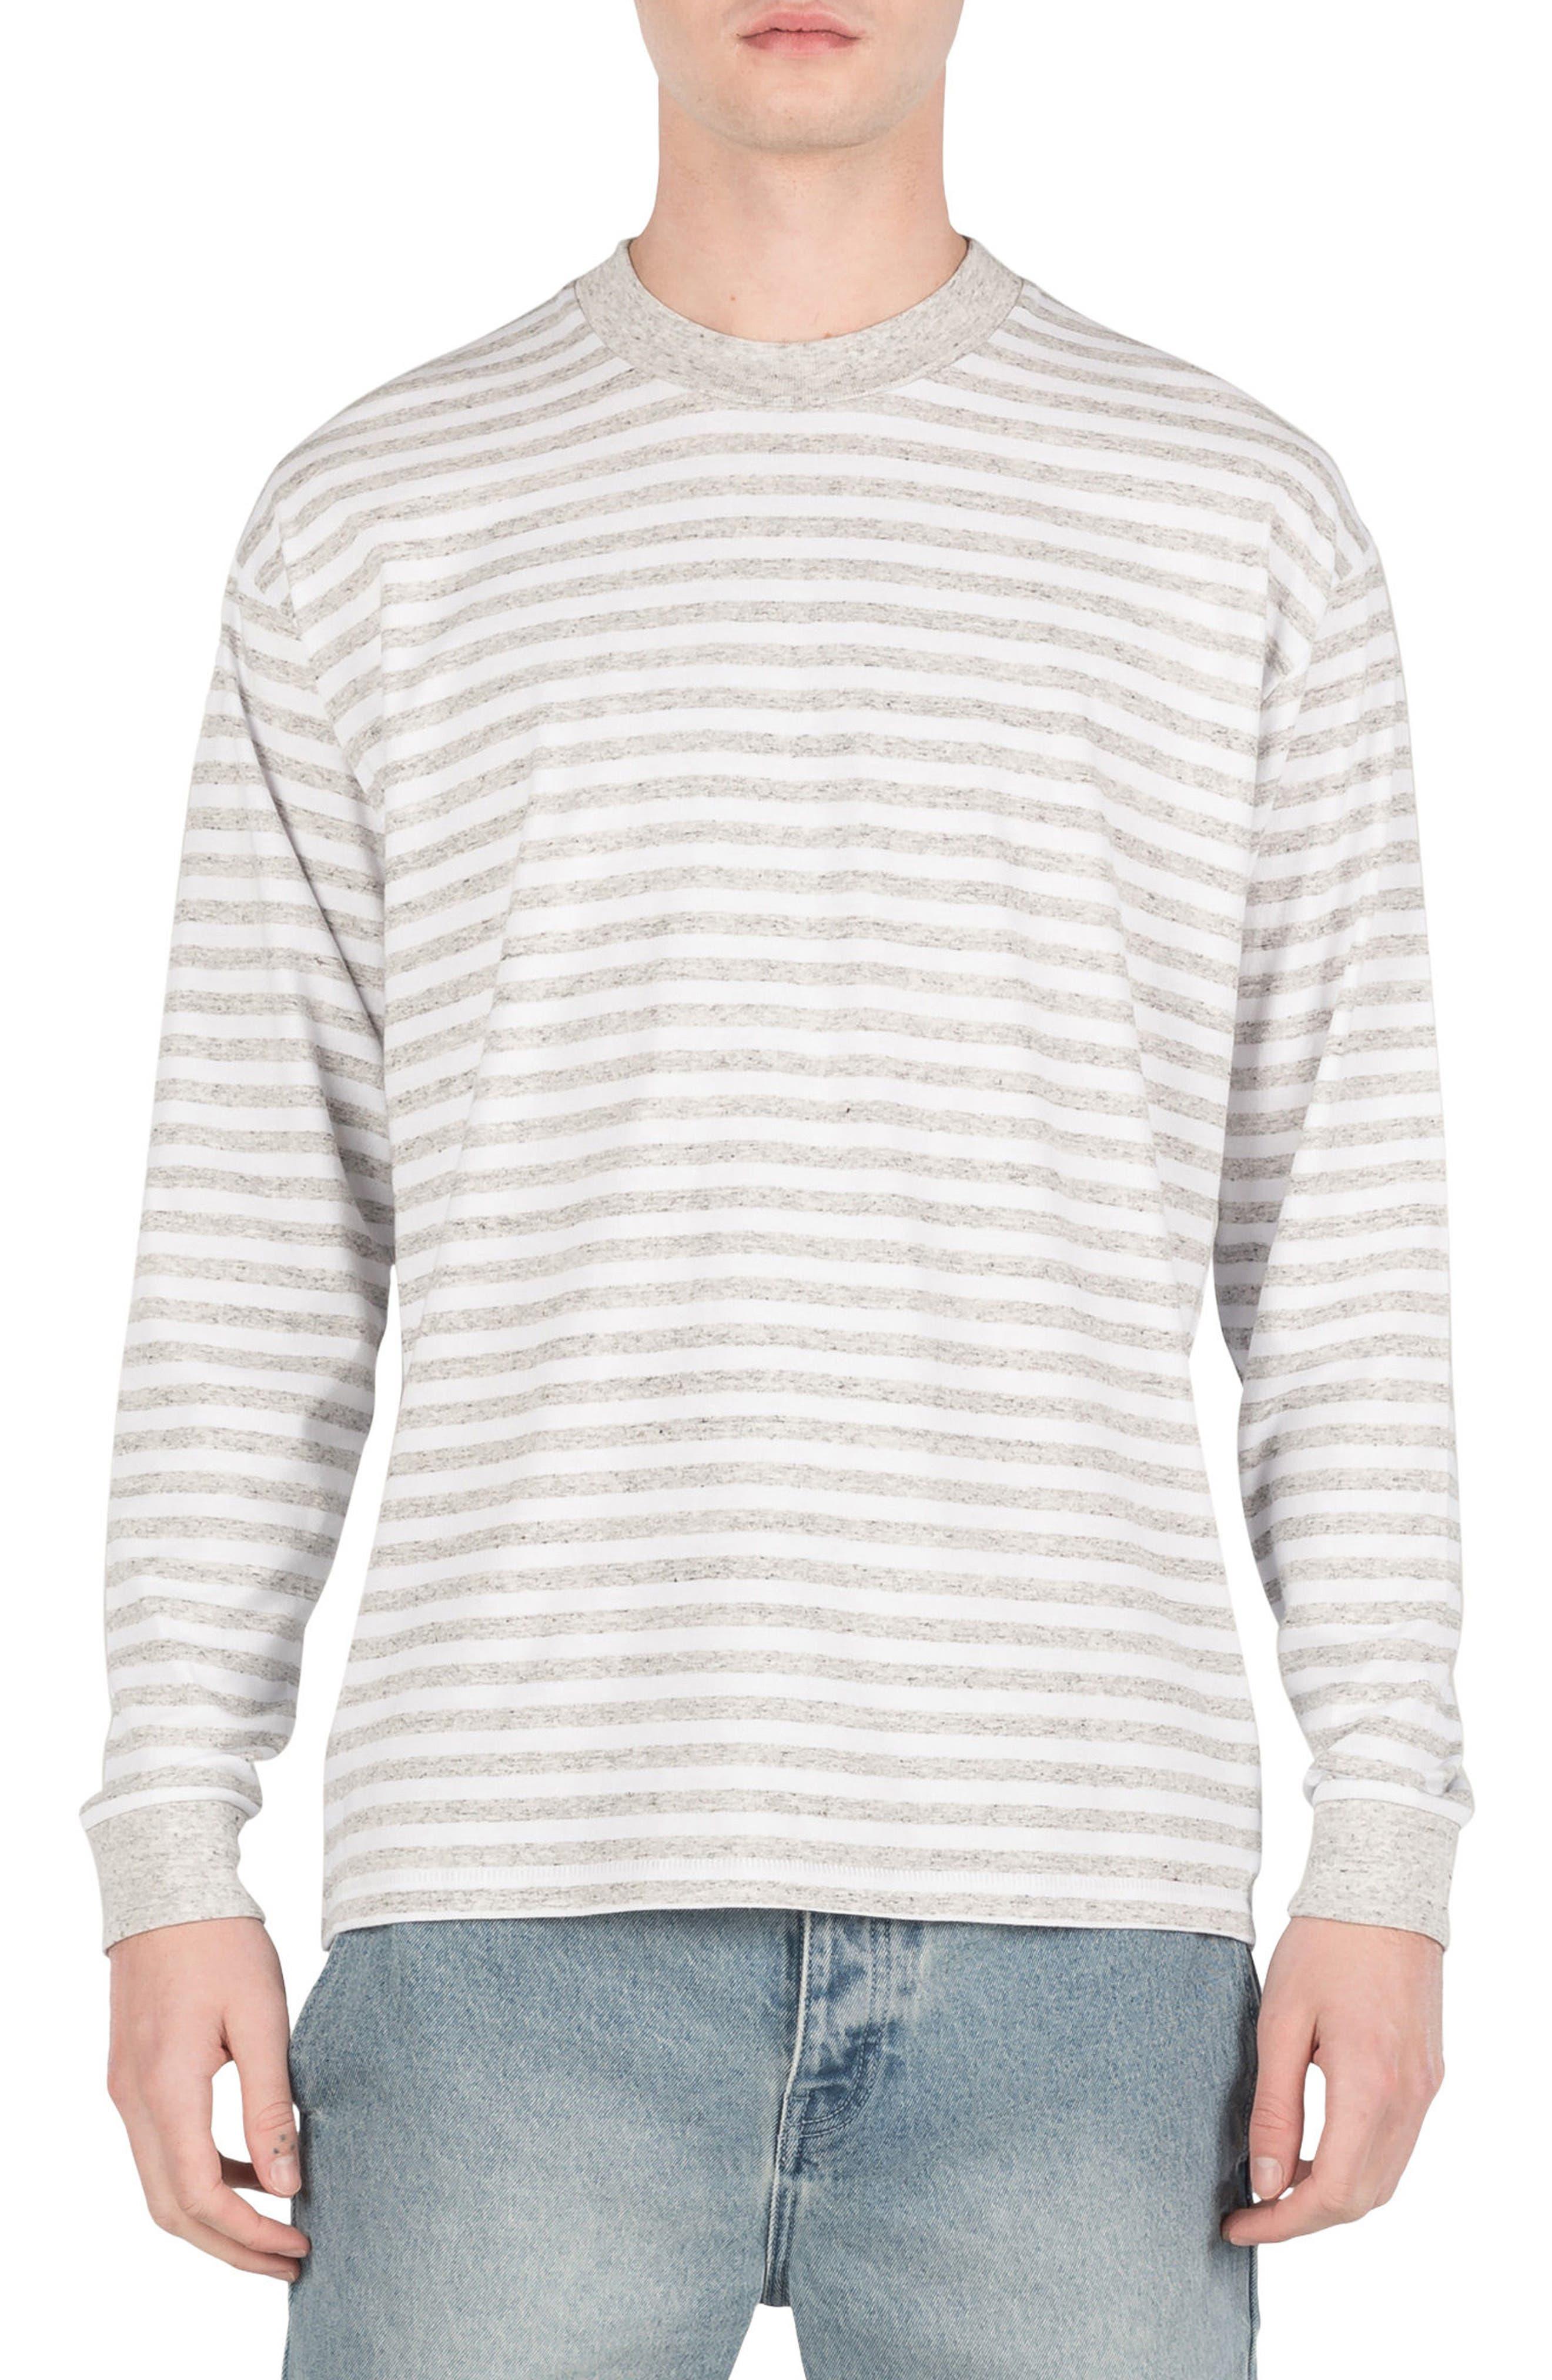 Box Long Sleeve T-Shirt,                         Main,                         color, White/ Storm Marle